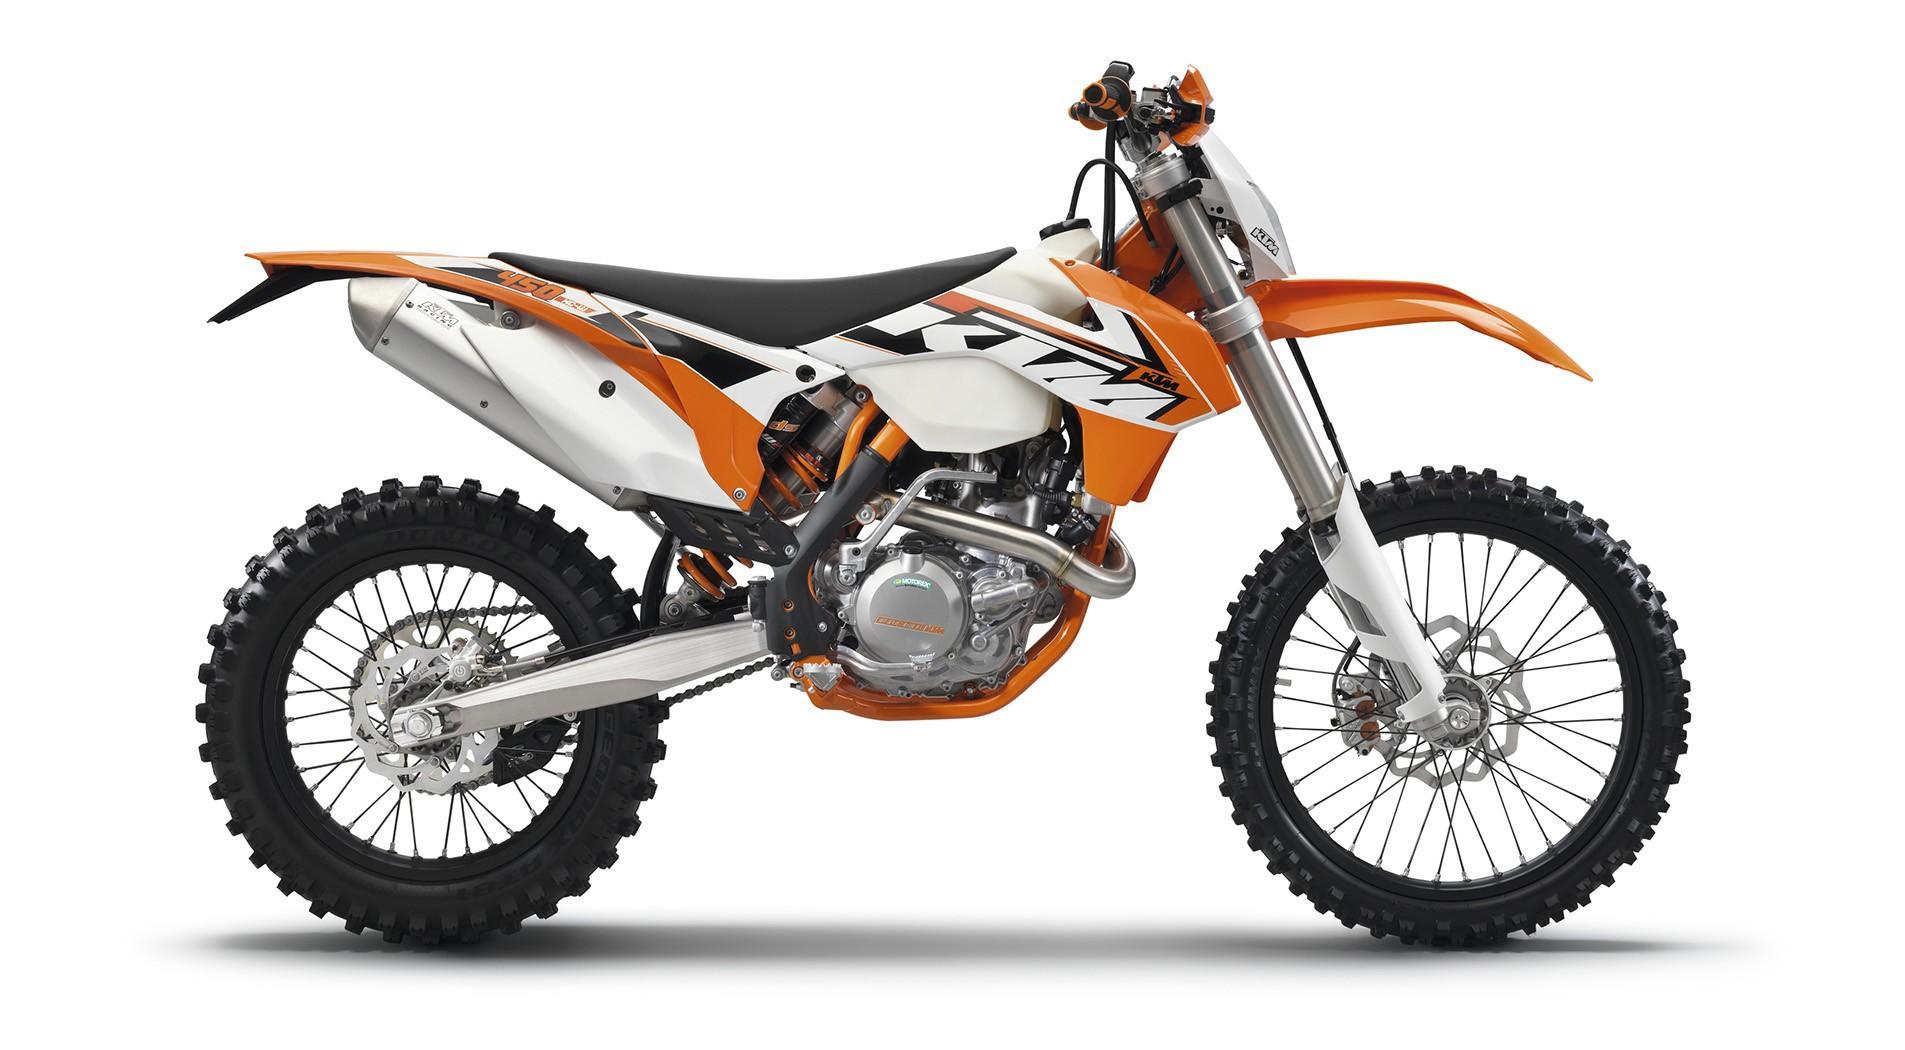 2015 KTM 450 XC-W in Orange, California